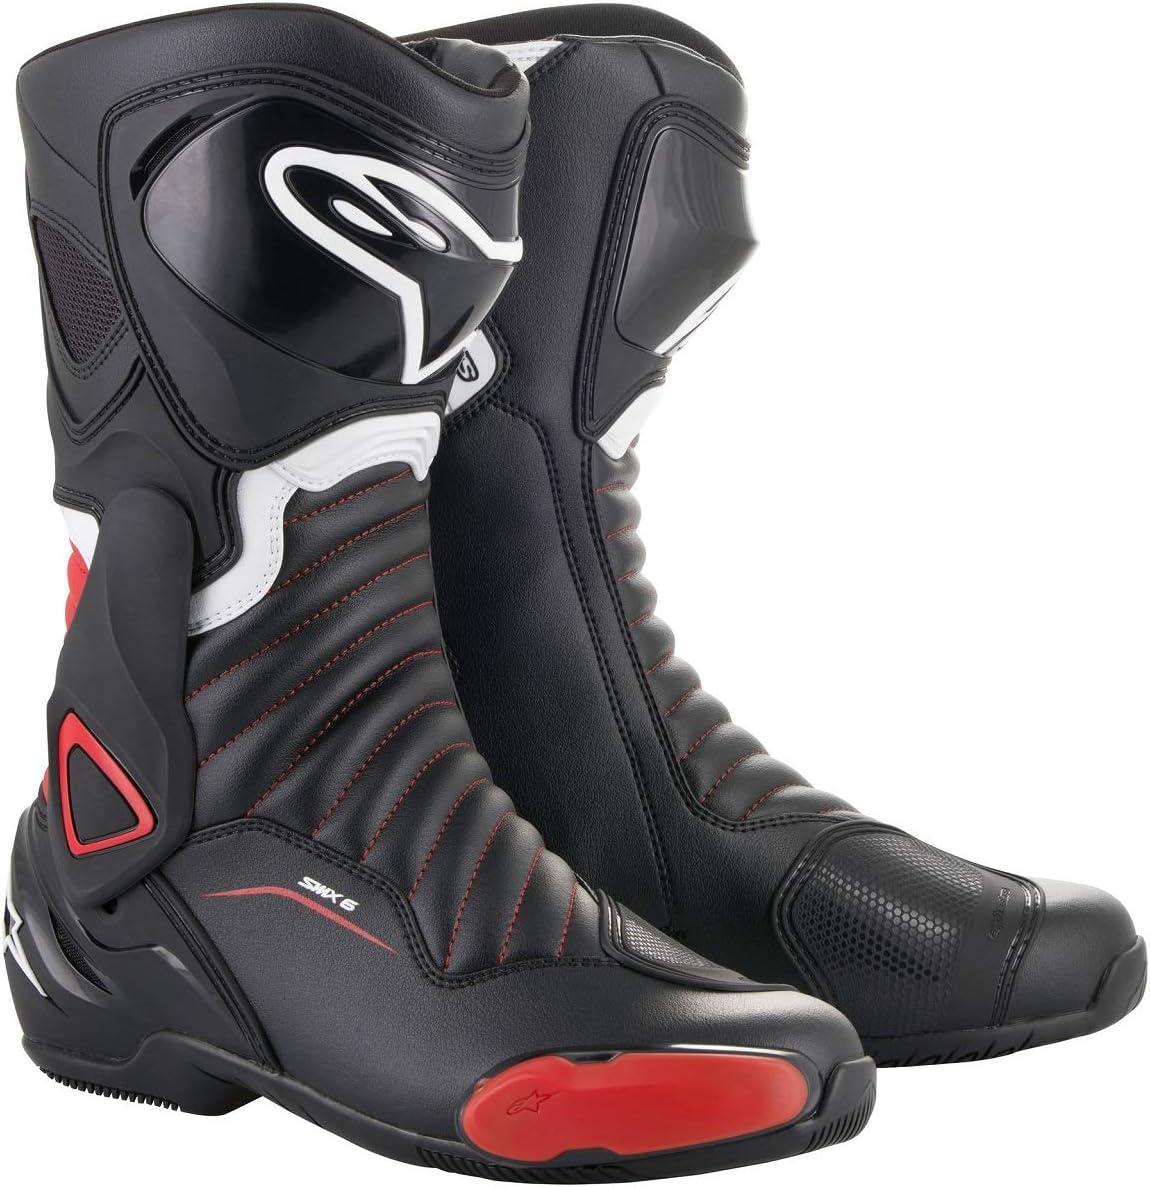 45 EU, Black Red SMX-6 v2 Motorcycle Boot